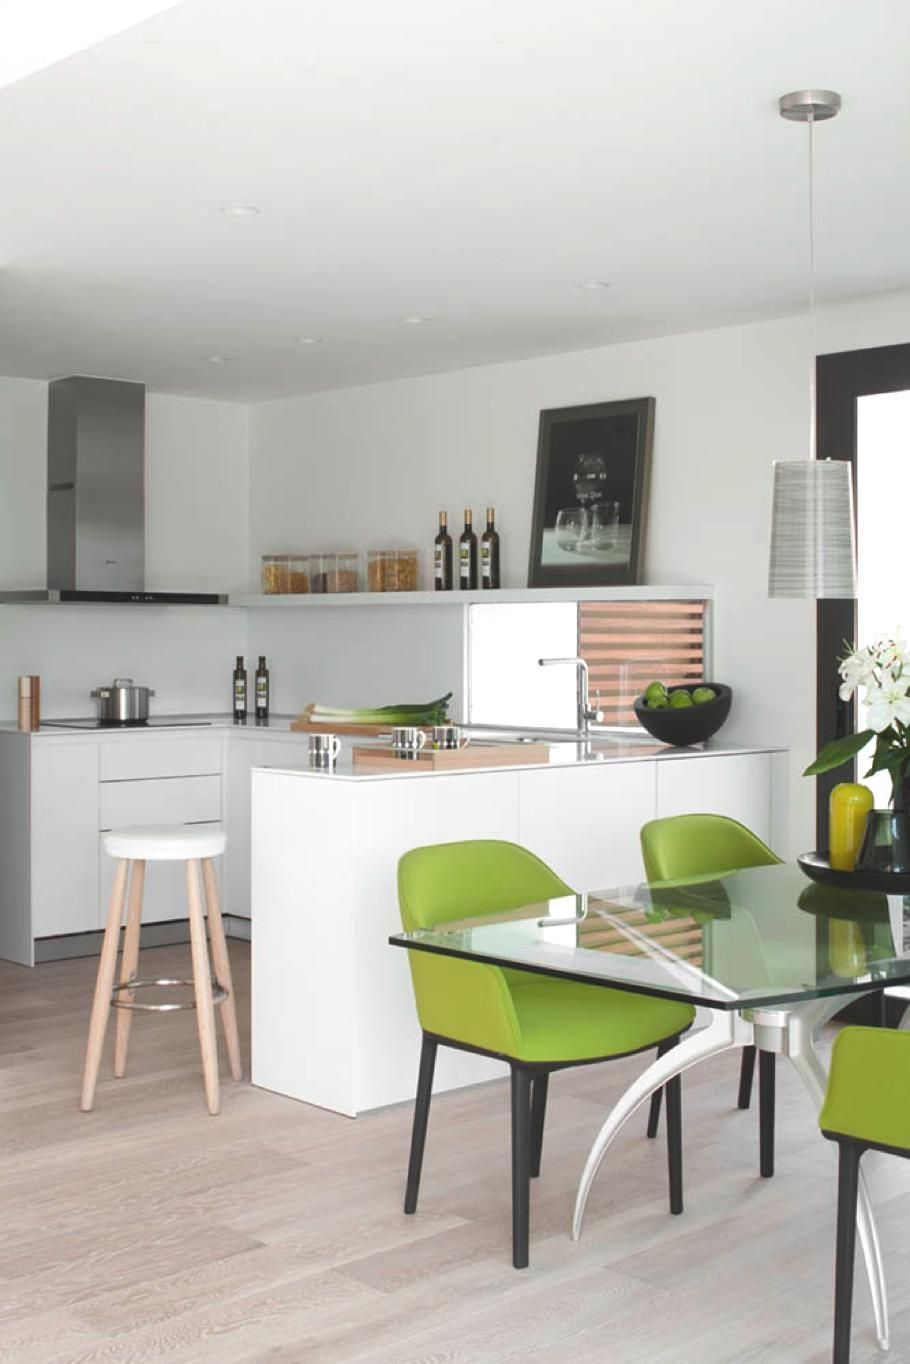 Luxury-Spanish-Villa-04 | ❃ Sweet Home A la Phara ❃ | Pinterest ...